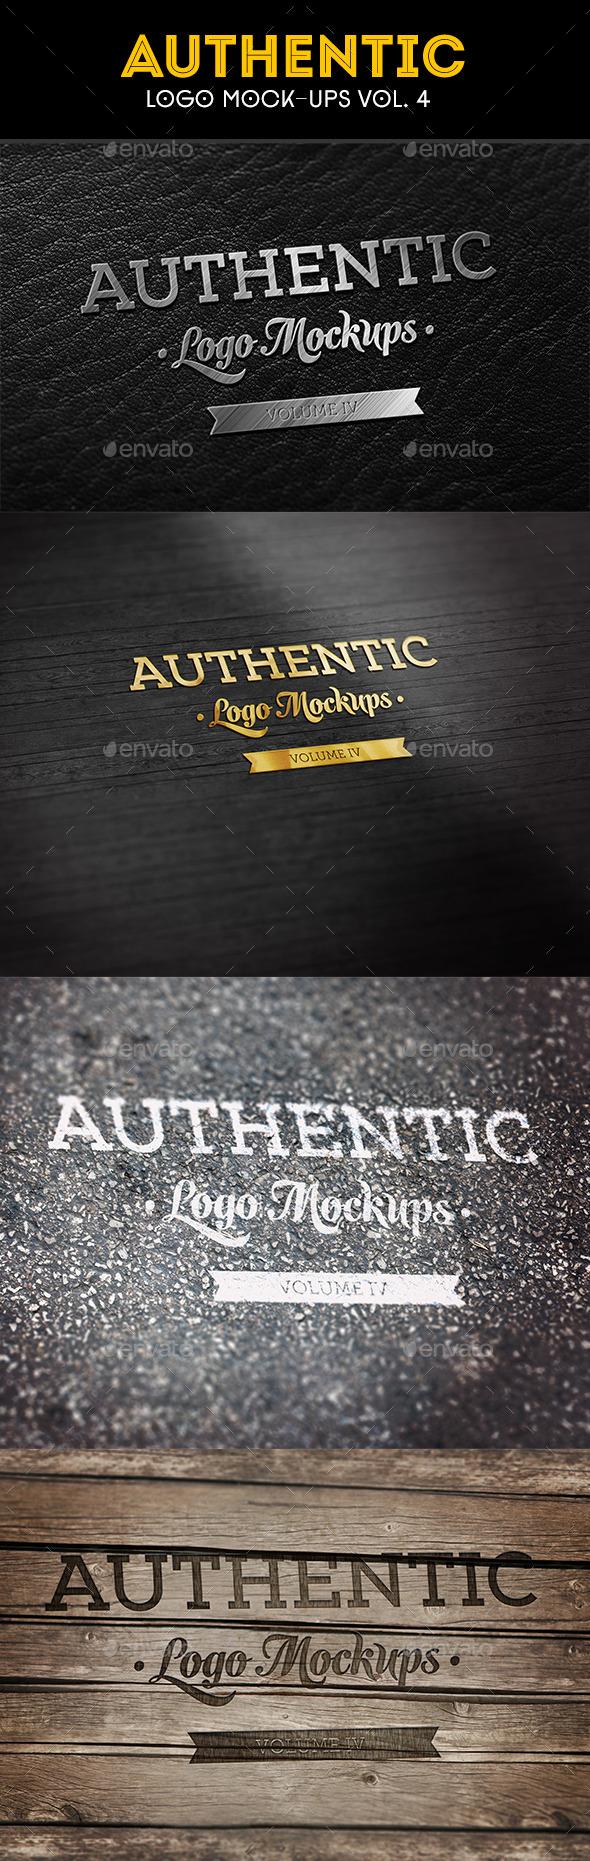 Authentic Logo Mockups Vol. 4 - Logo Product Mock-Ups